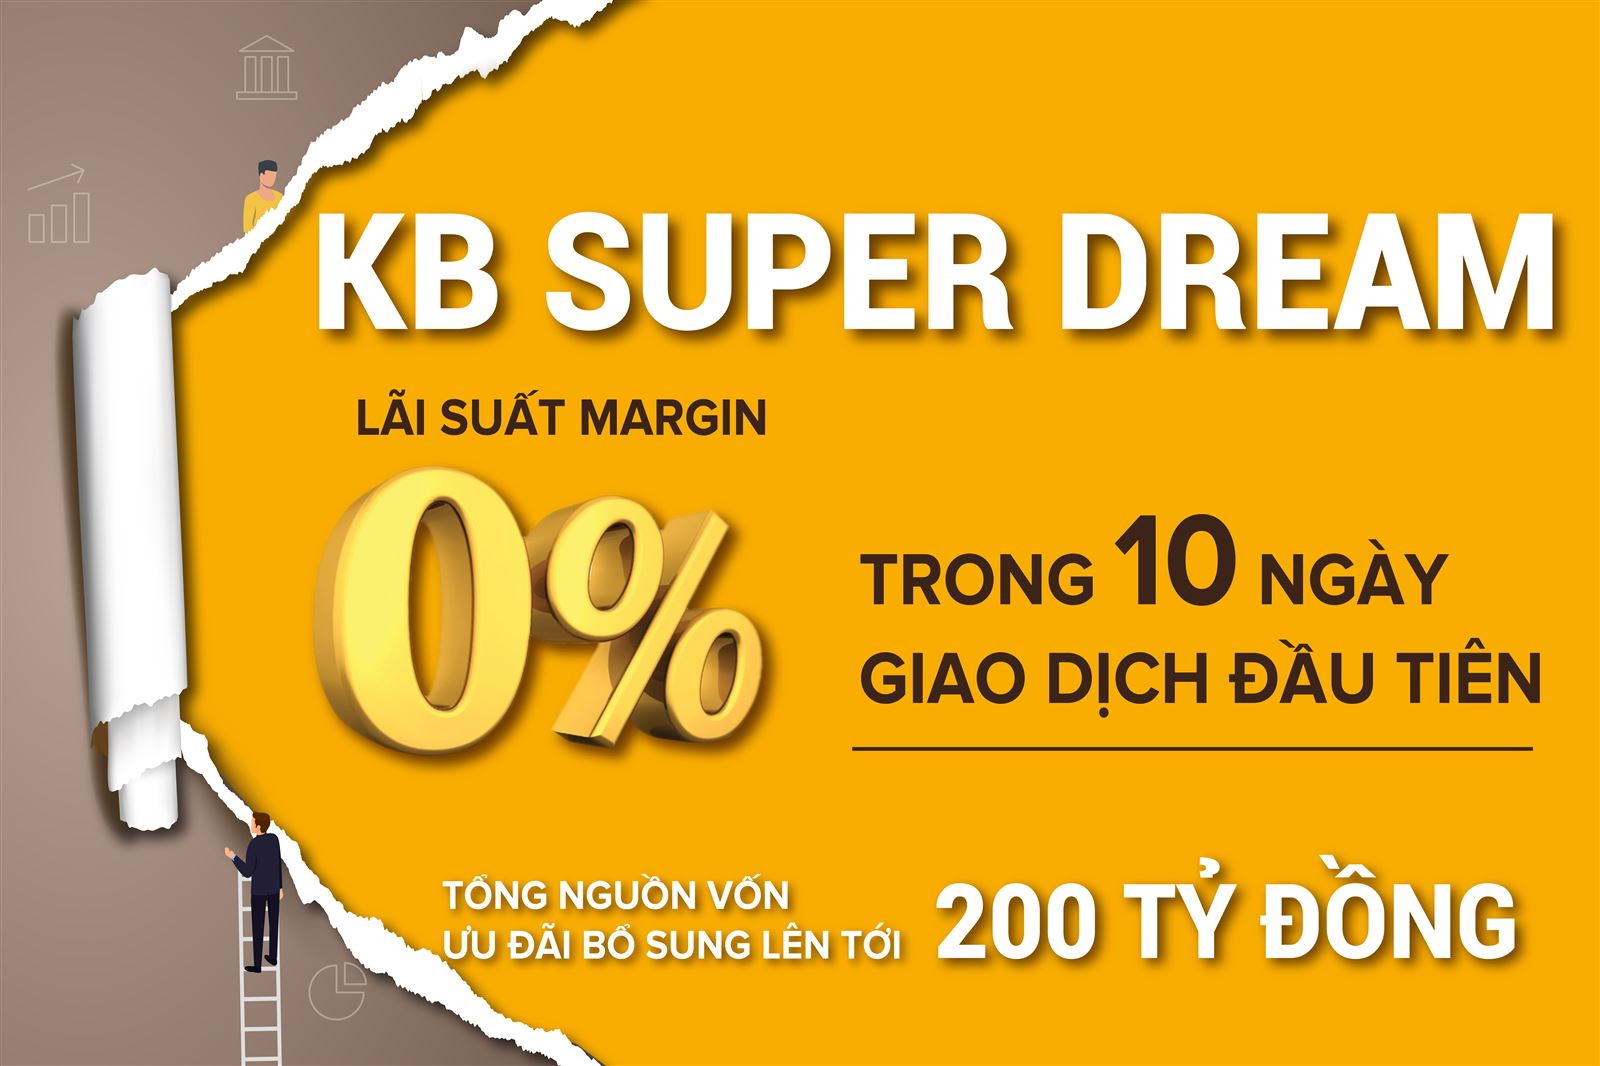 Sản phẩm KB Super Dream